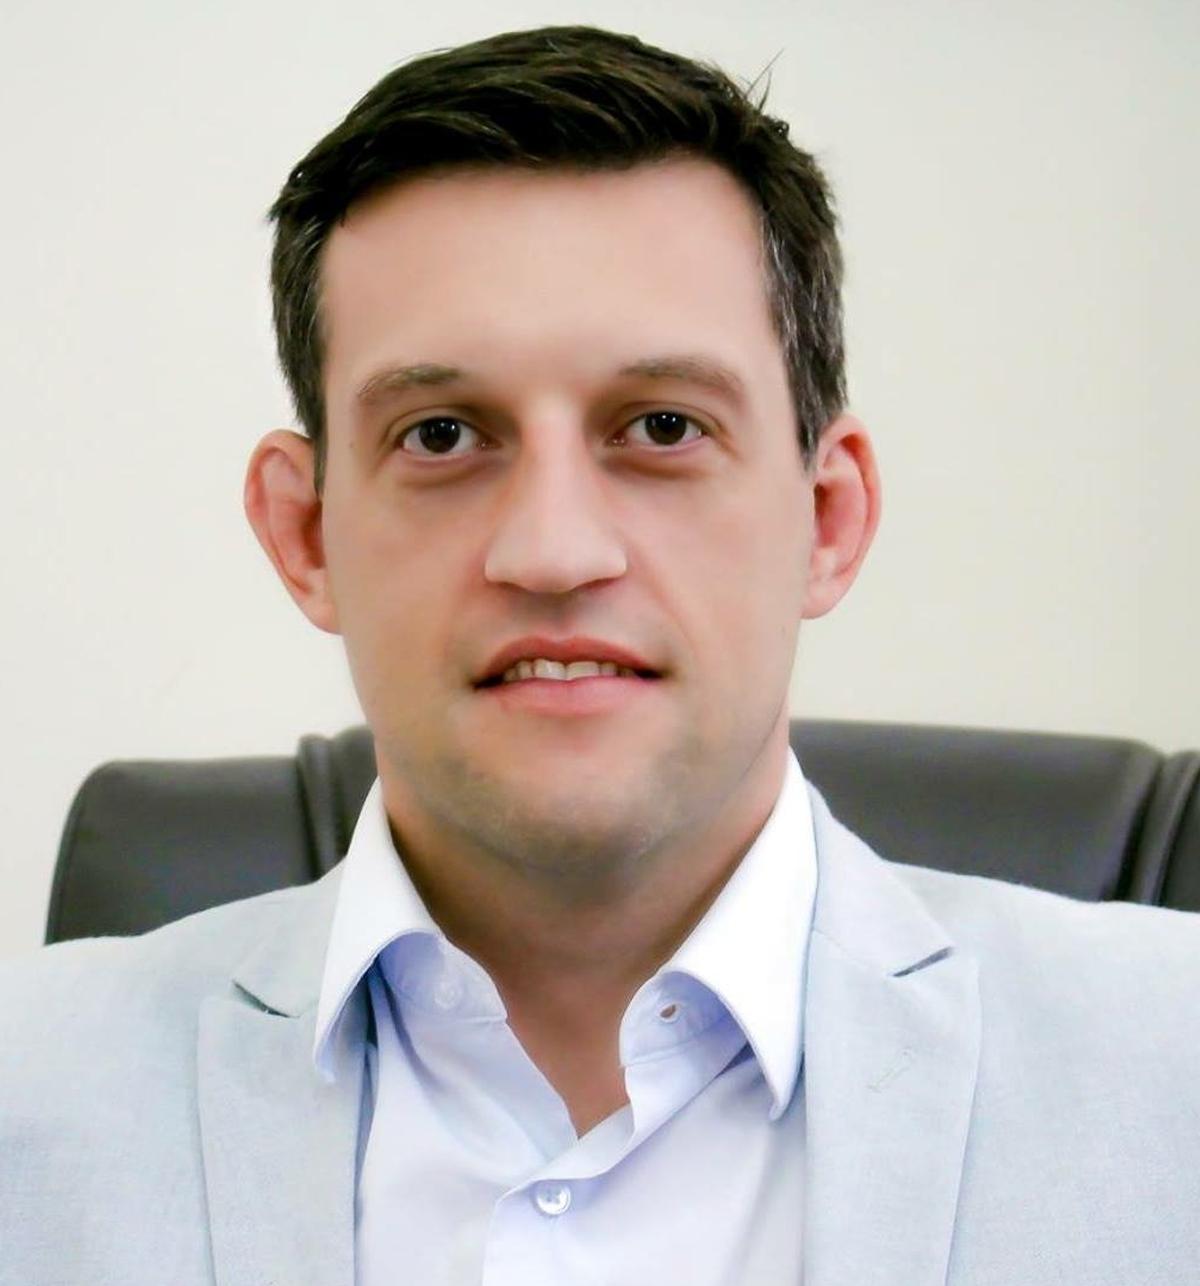 Guilherme Rech Pasin